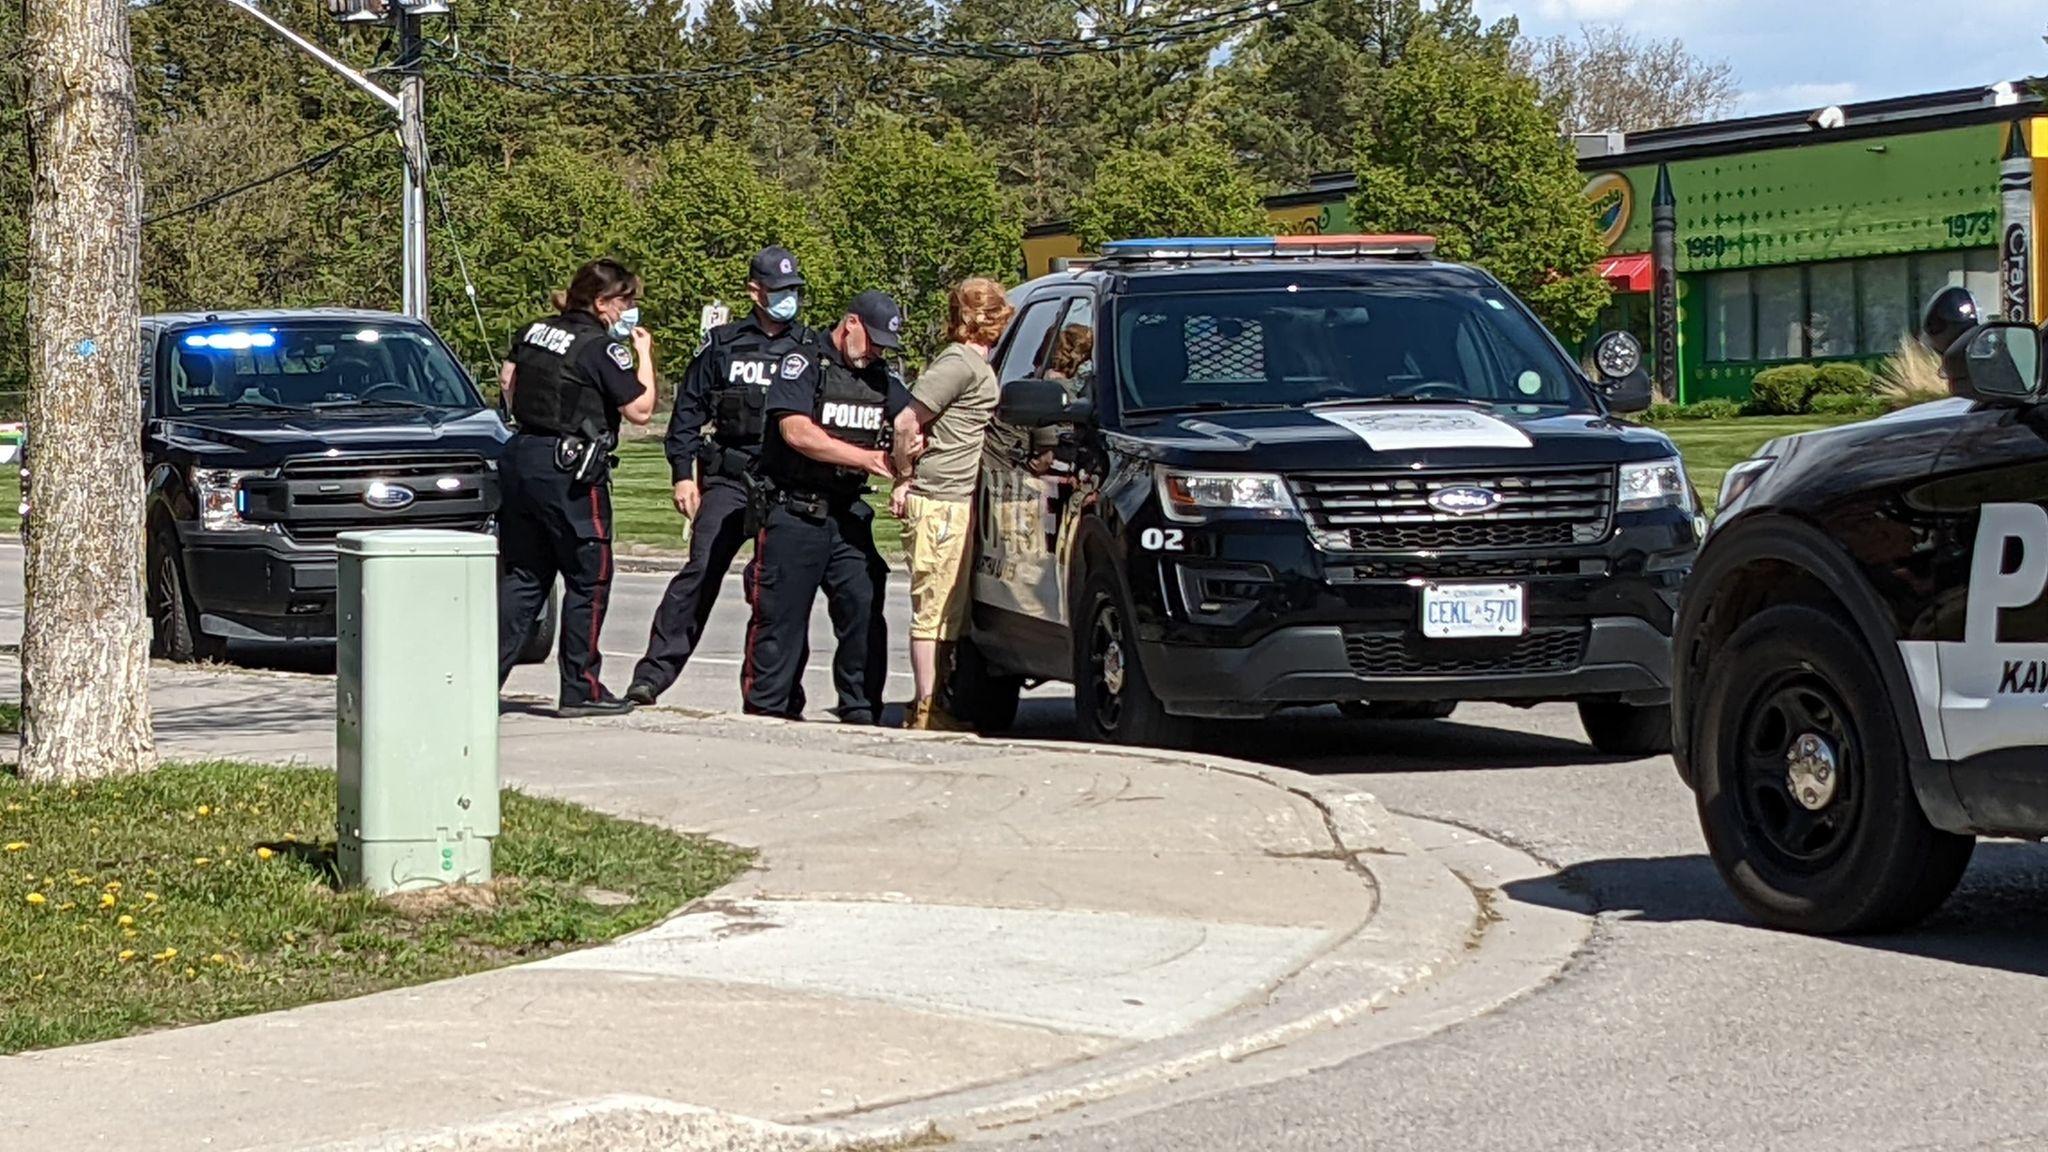 Video — Police arrest suspect following firearm call in Lindsay